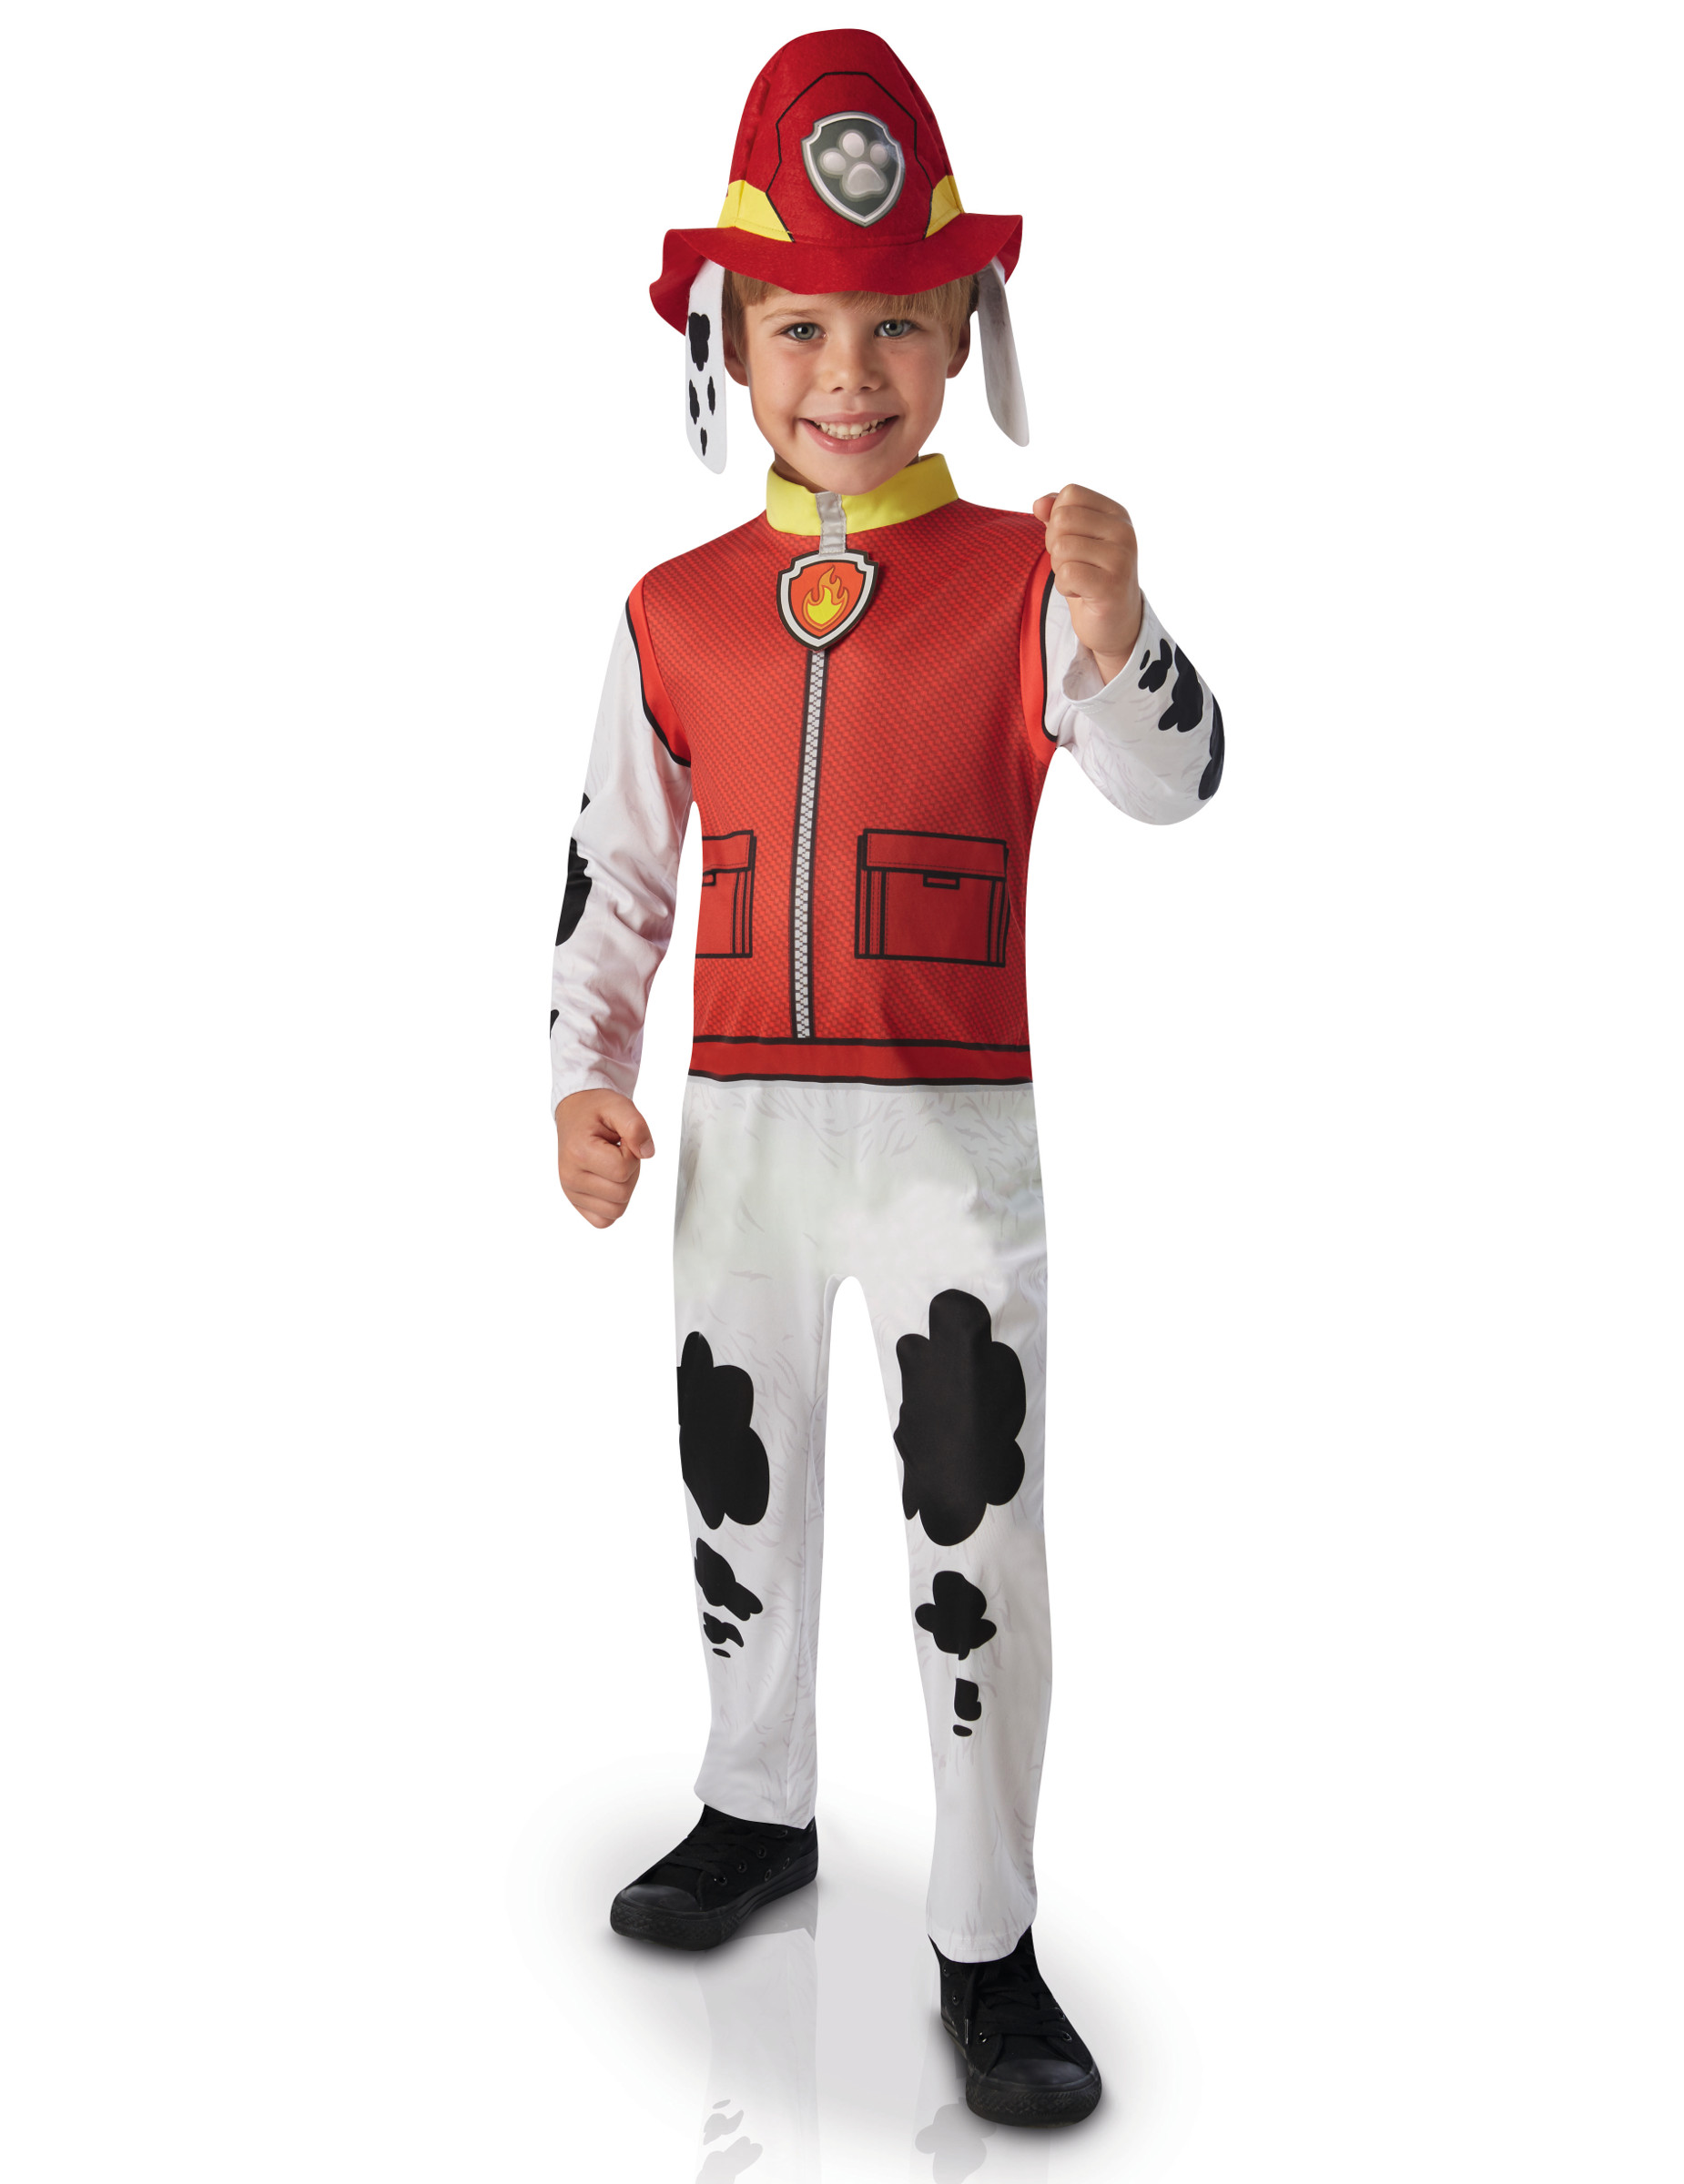 0d42ec0e5986 Costumi in licenza ufficiale Paw Patrol™ per bambini - Vegaoo.it